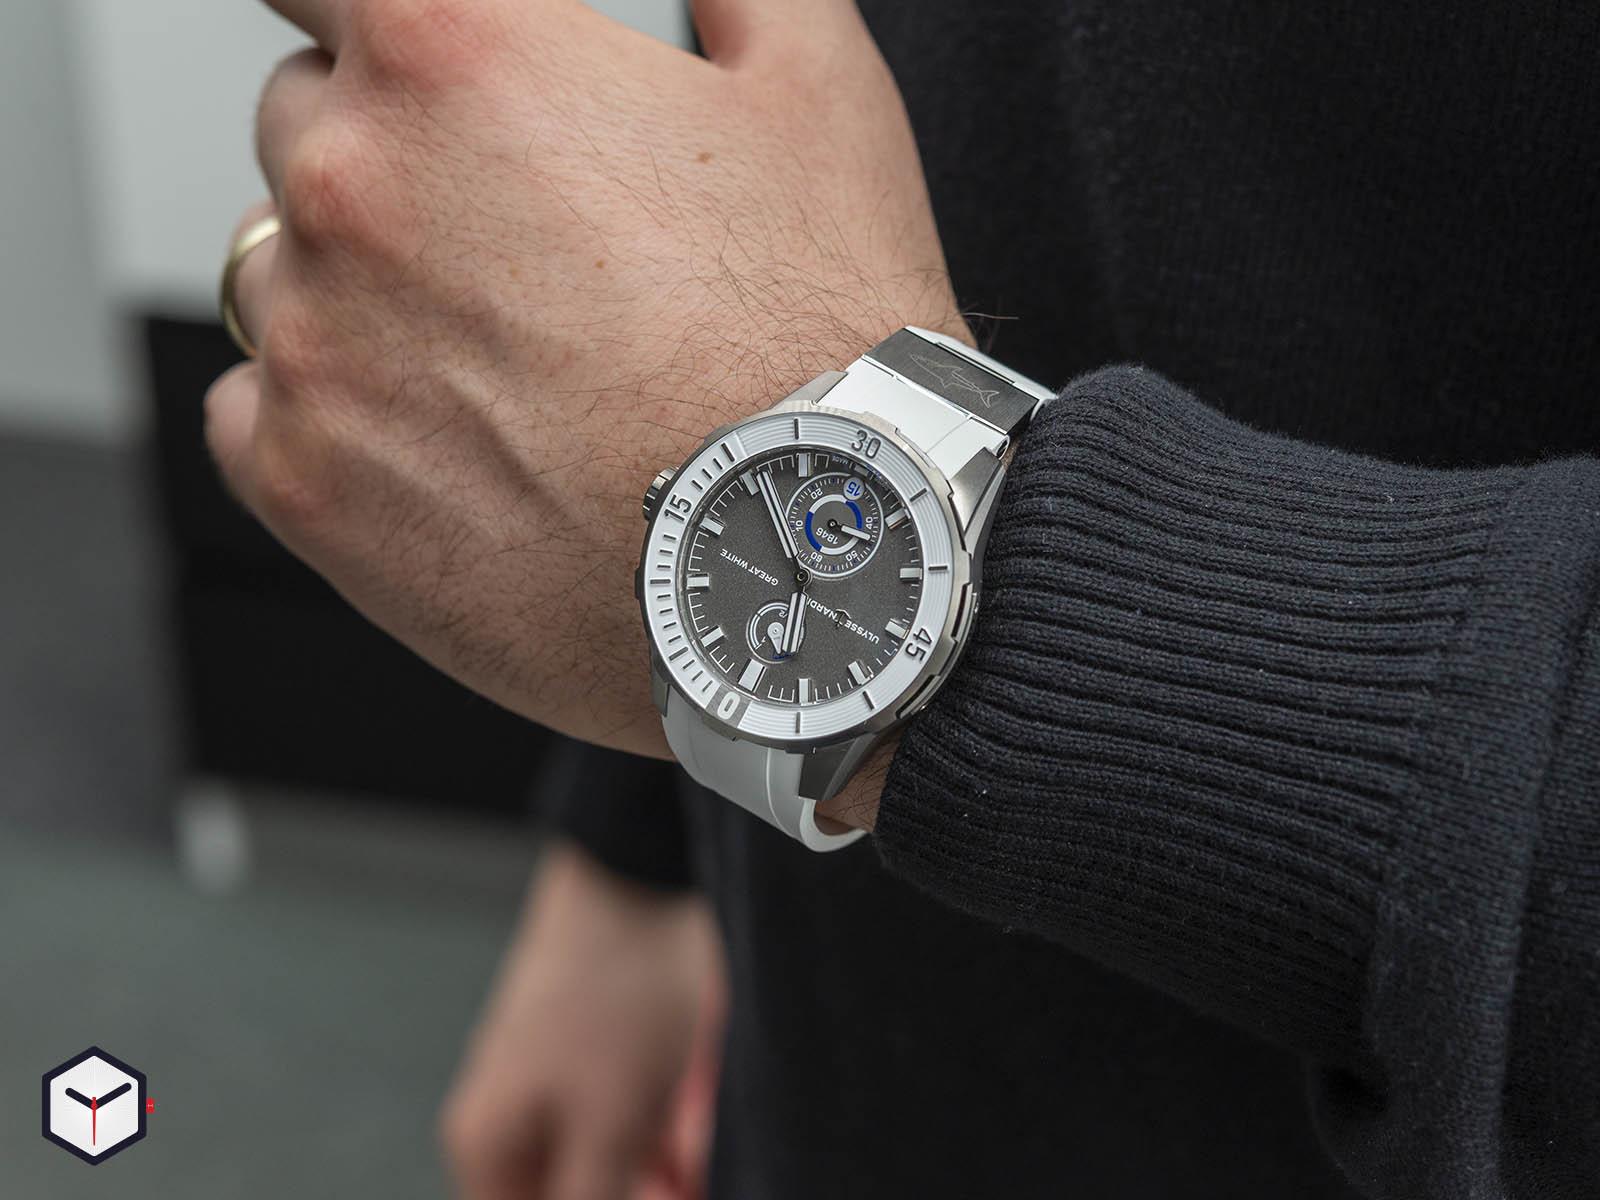 1183-170le-3-90-gw-ulysse-nardin-diver-chronometer-8.jpg